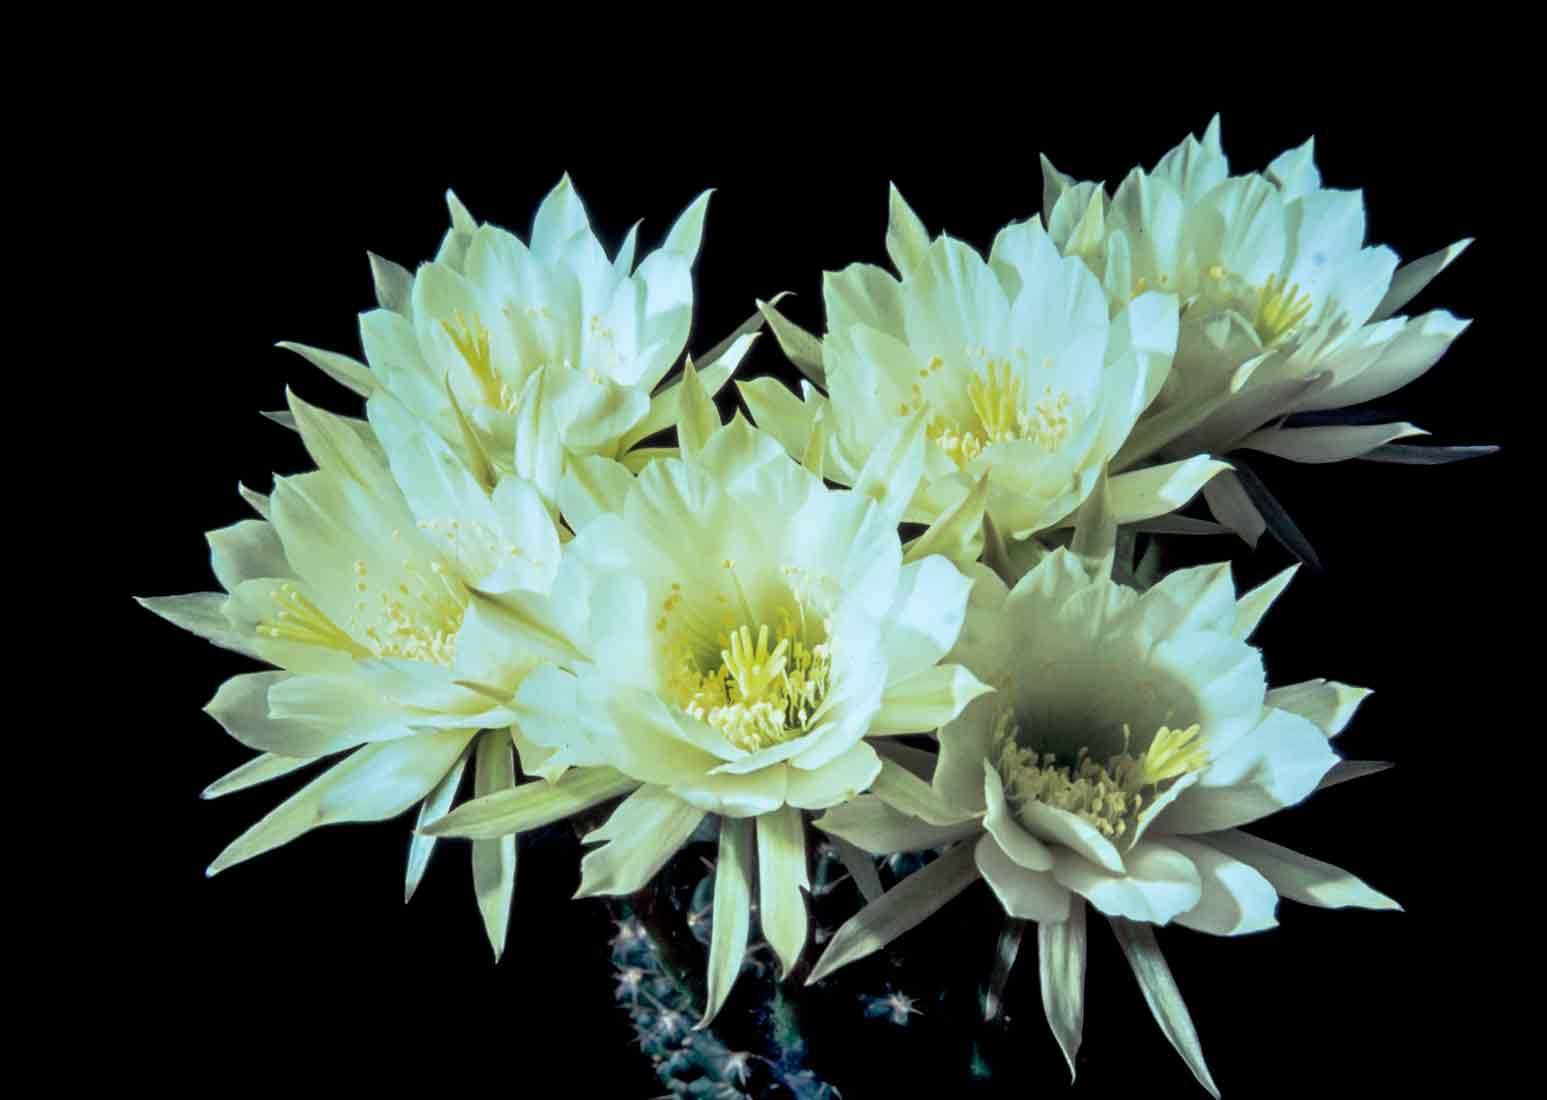 Pseudolobivia-polyacantha-1980